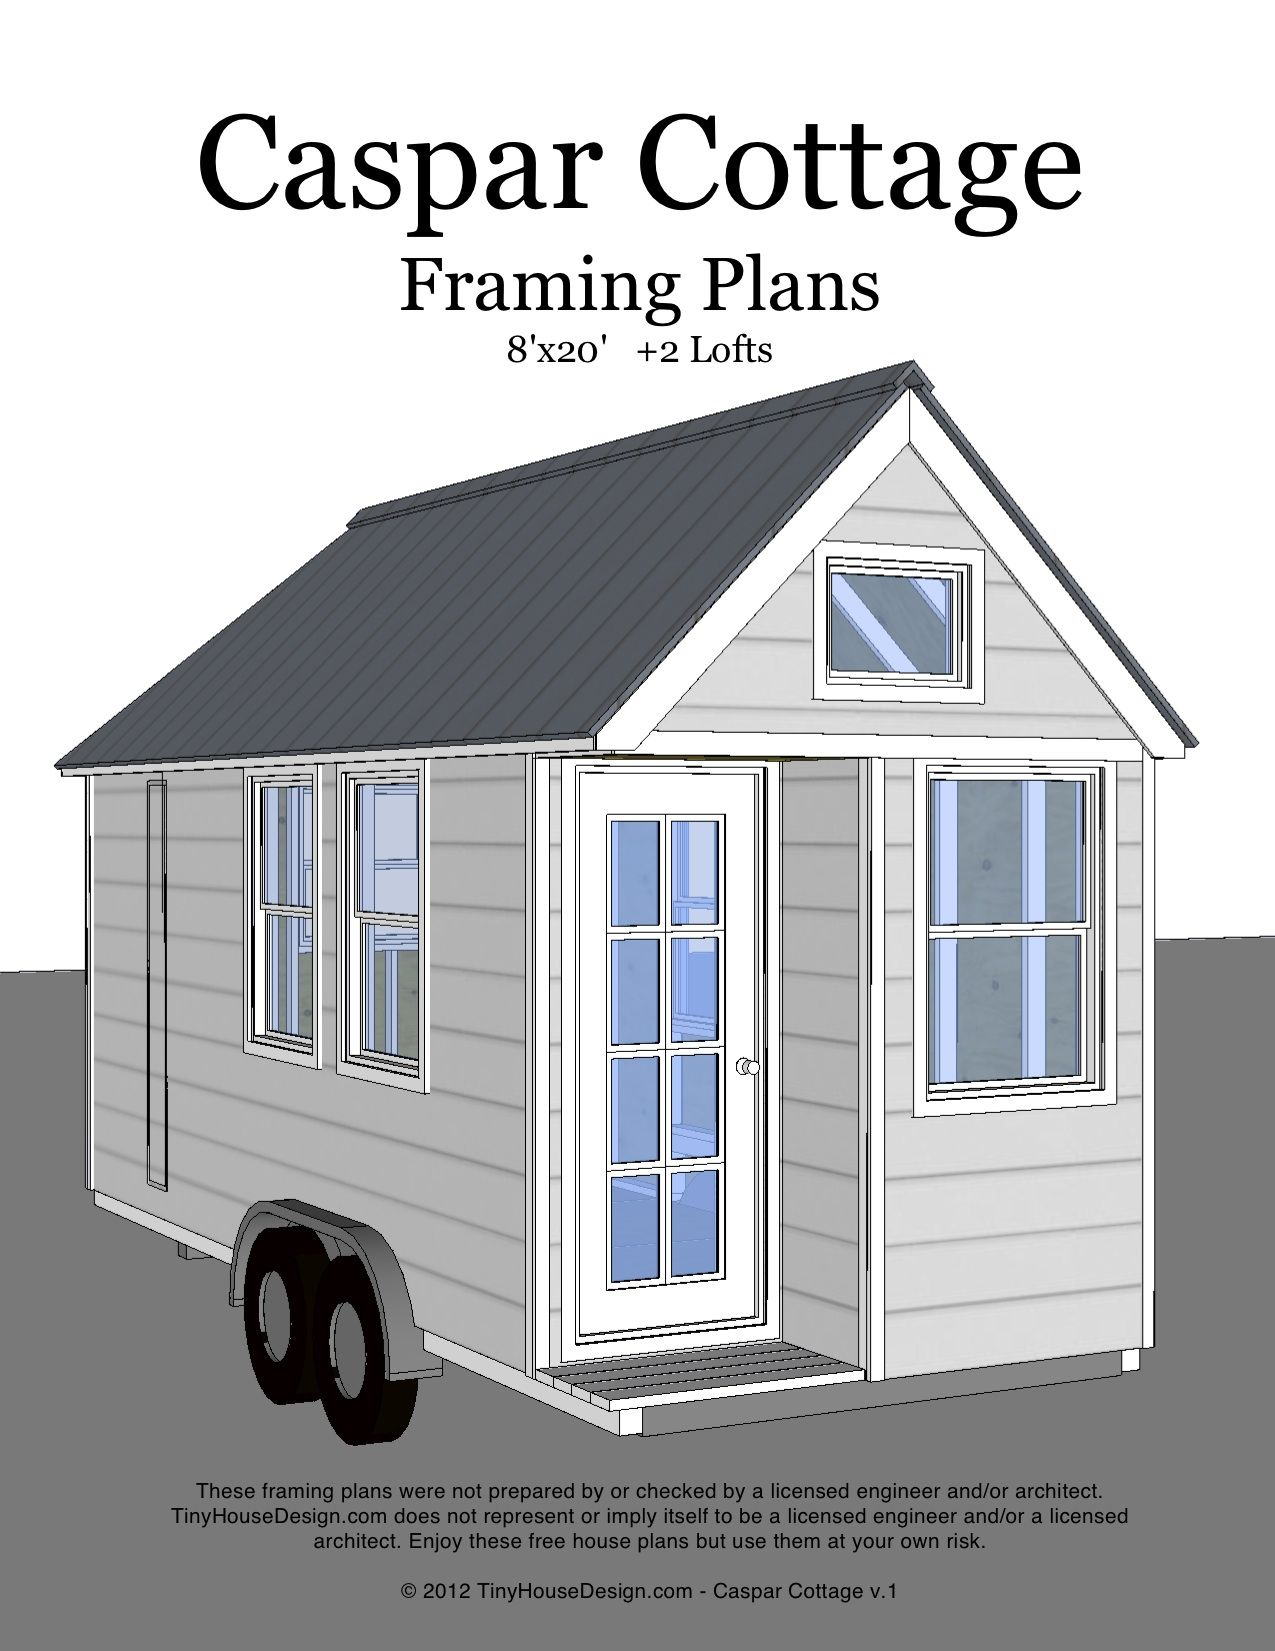 Caspar Cottage 8x20 Cover (With images) Cheap tiny